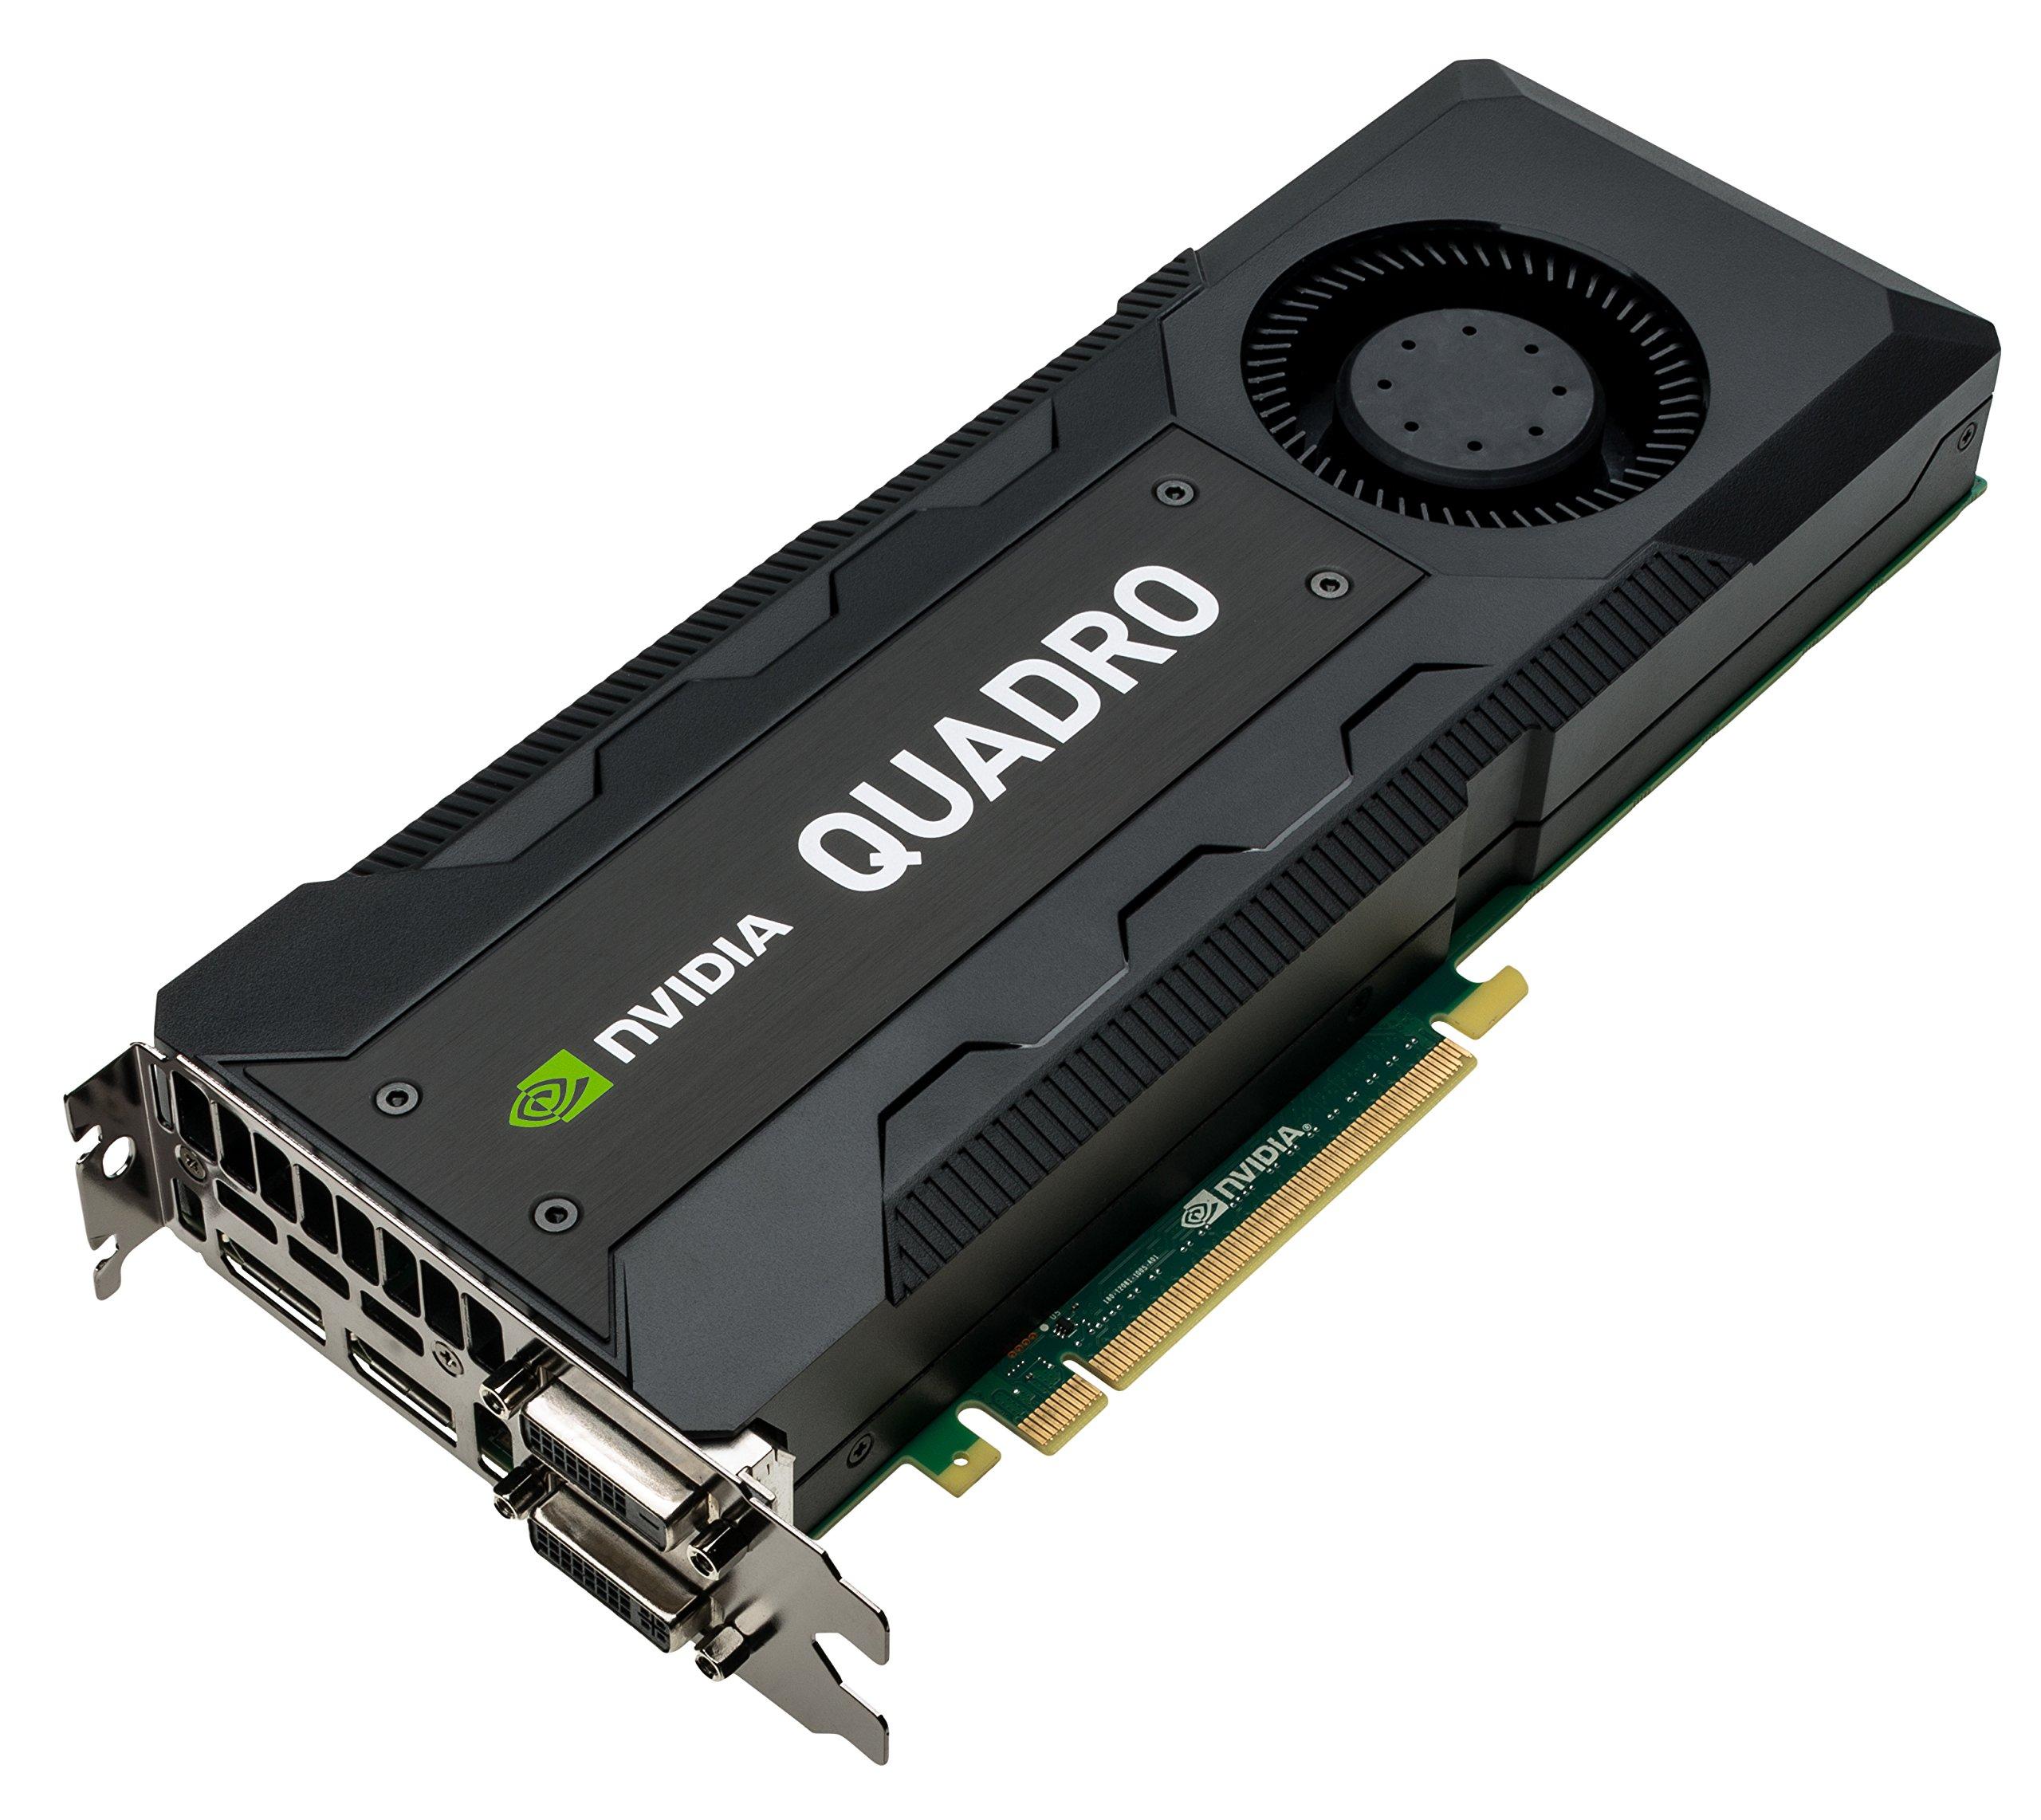 HP NVIDIA QUADRO K5200 GPU MODULE